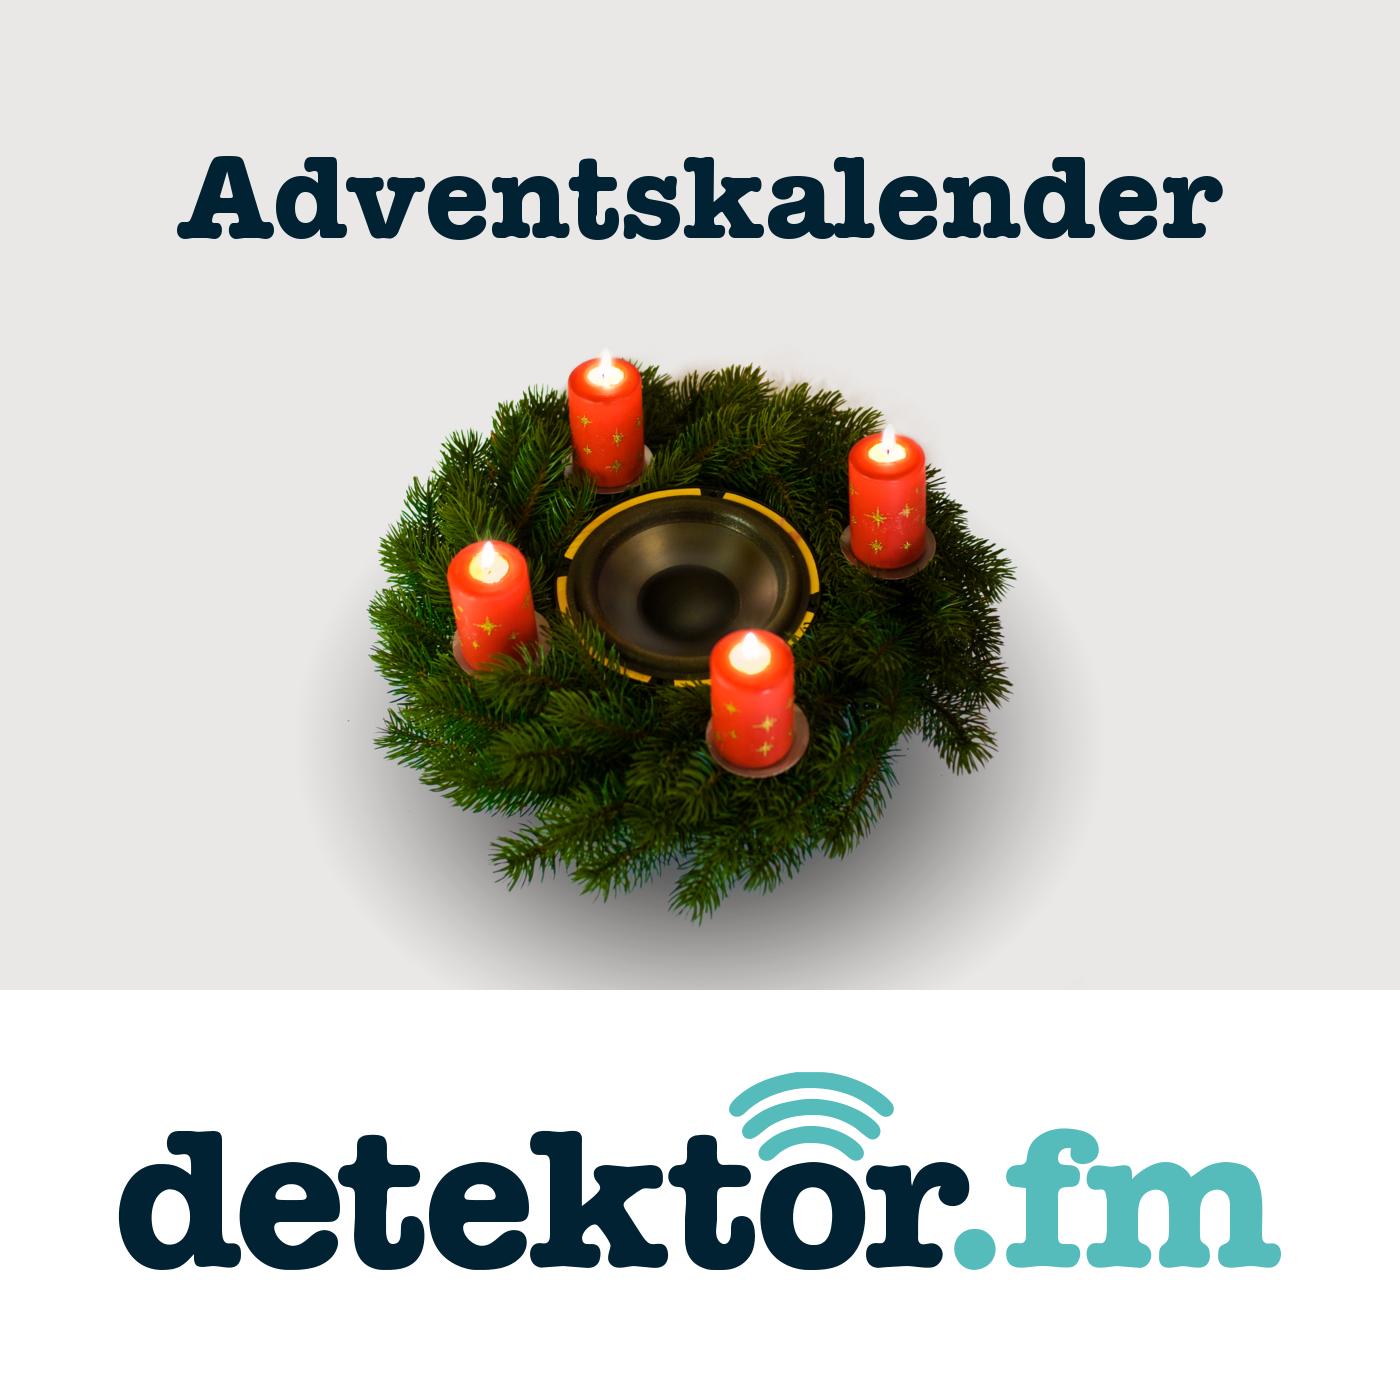 detektor.fm » Adventskalender